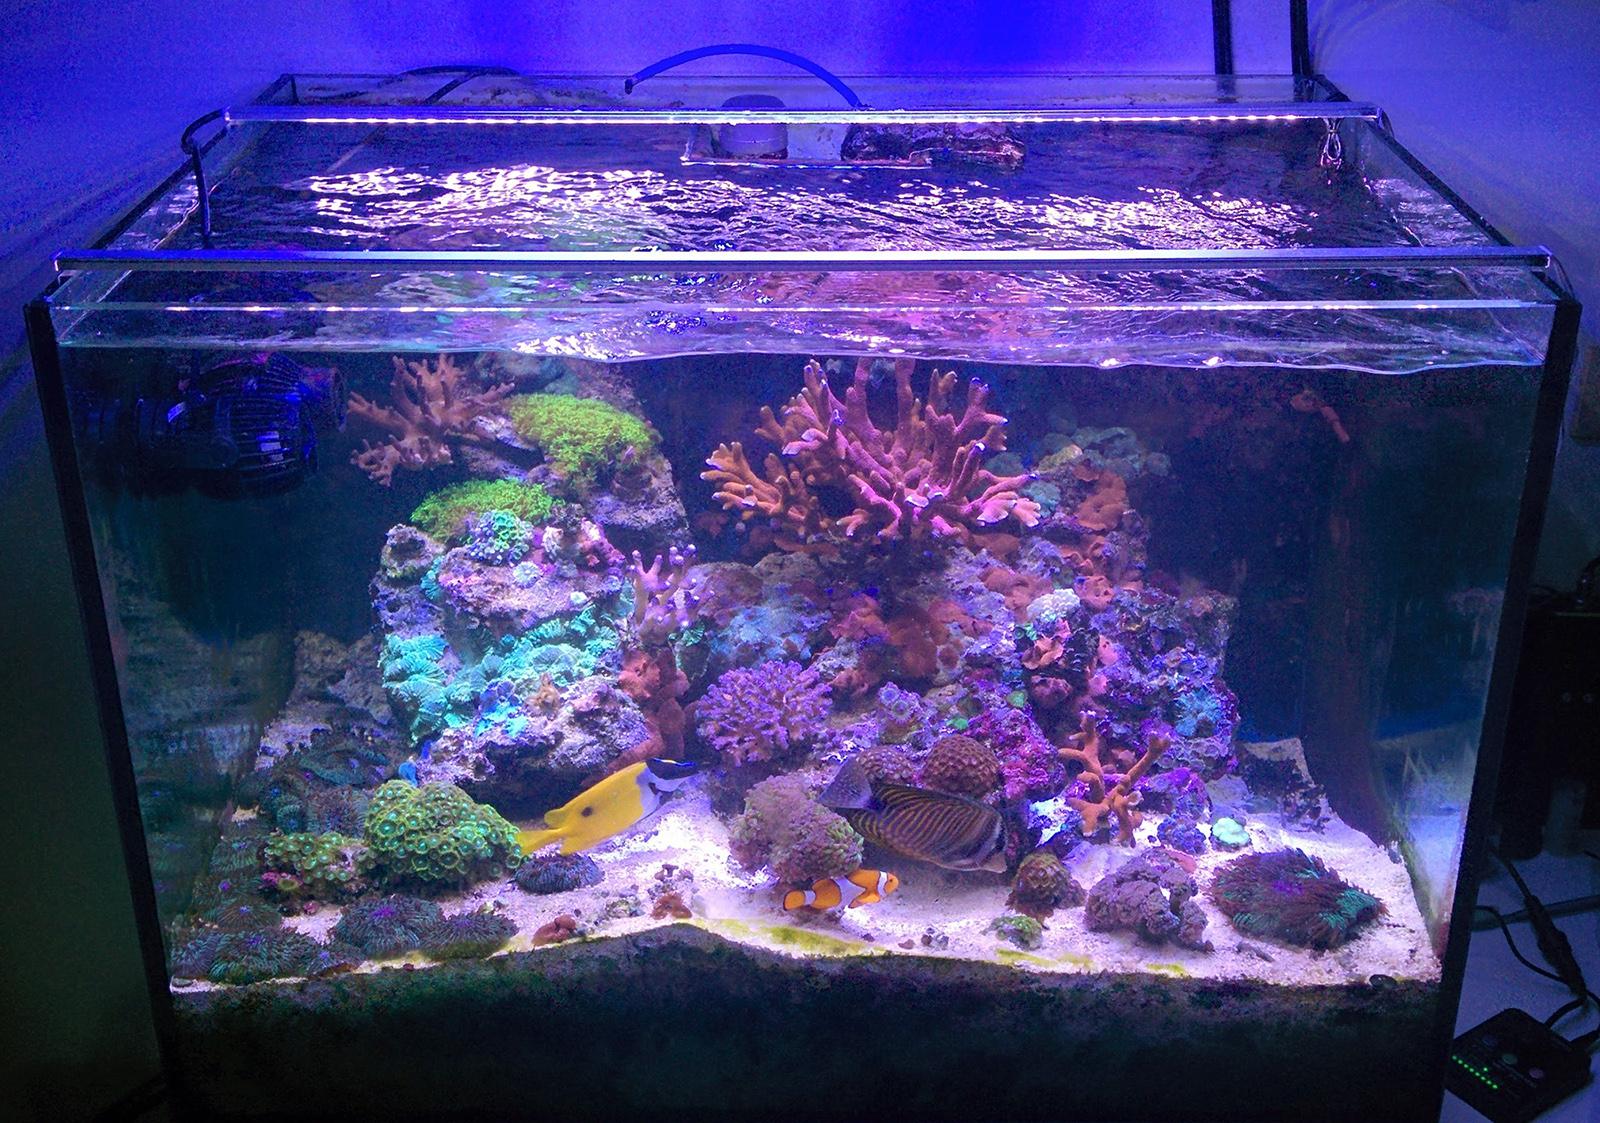 Piante Per Acquario Marino : Acquario marino tropicale 'easy lps